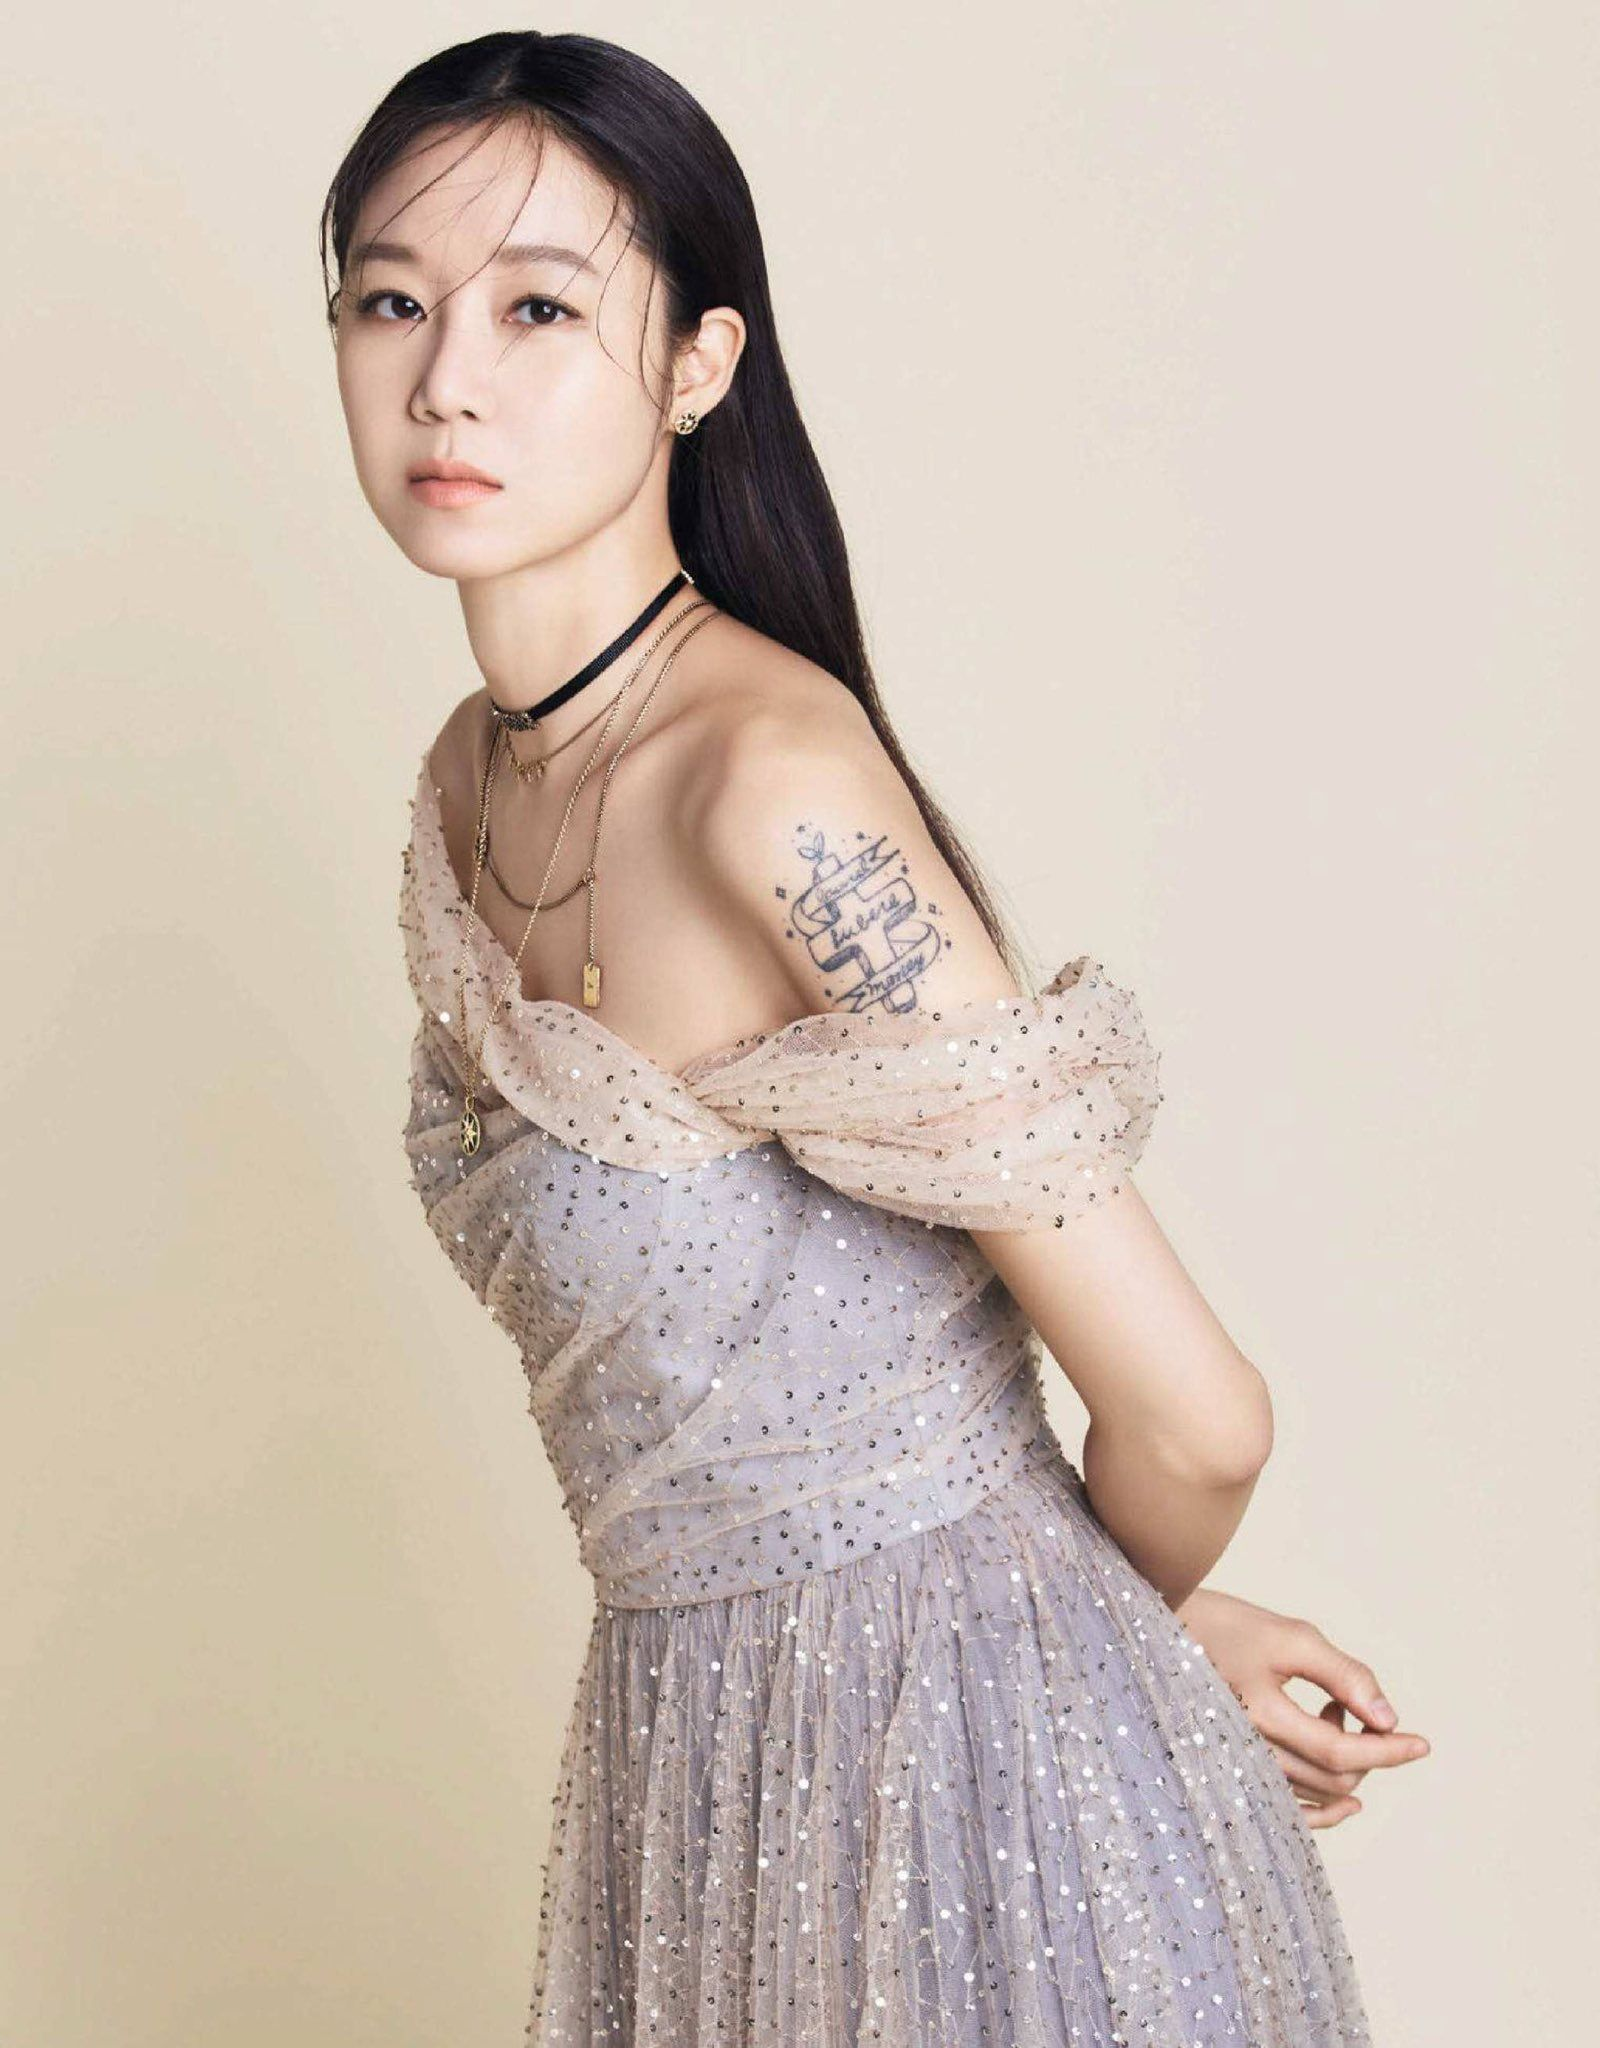 Topless Video Jestina-Lam naked photo 2017